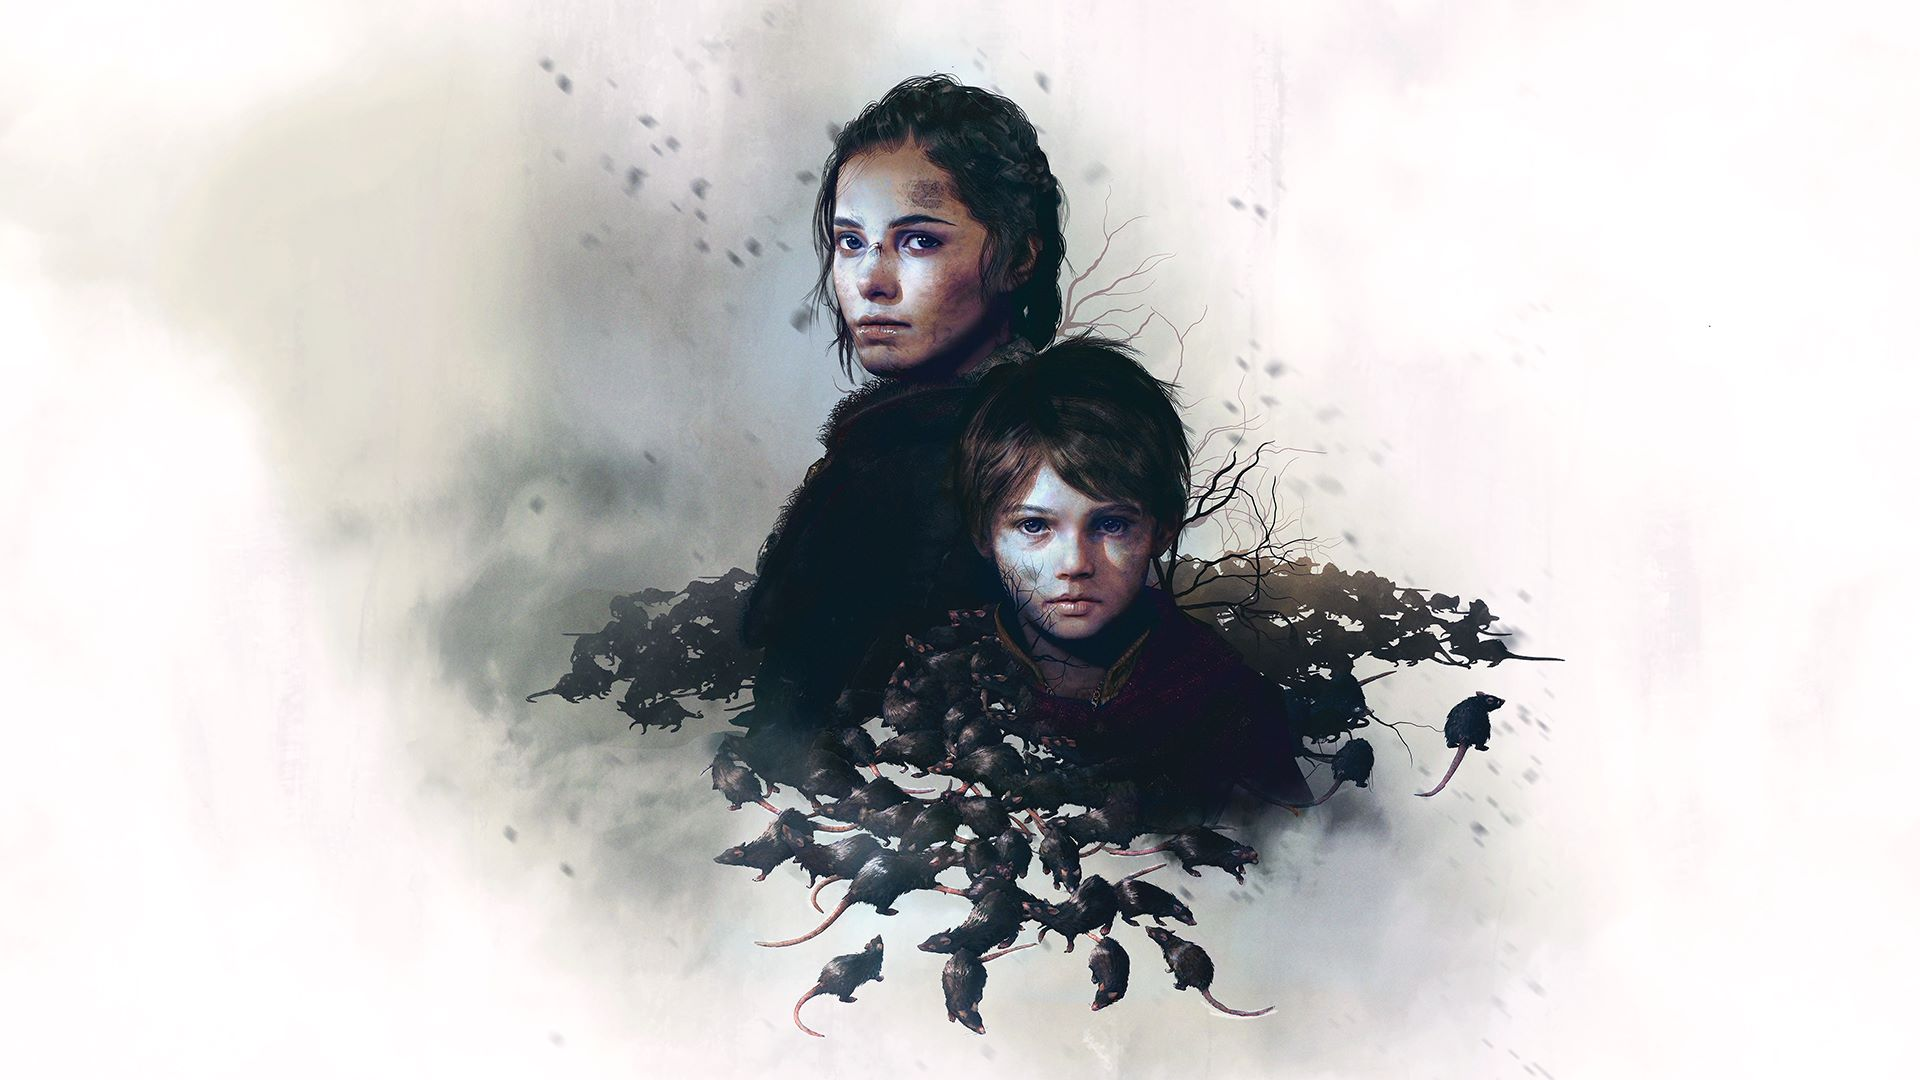 A Plague Tale: Innocence излезе и положителните отзиви за нея